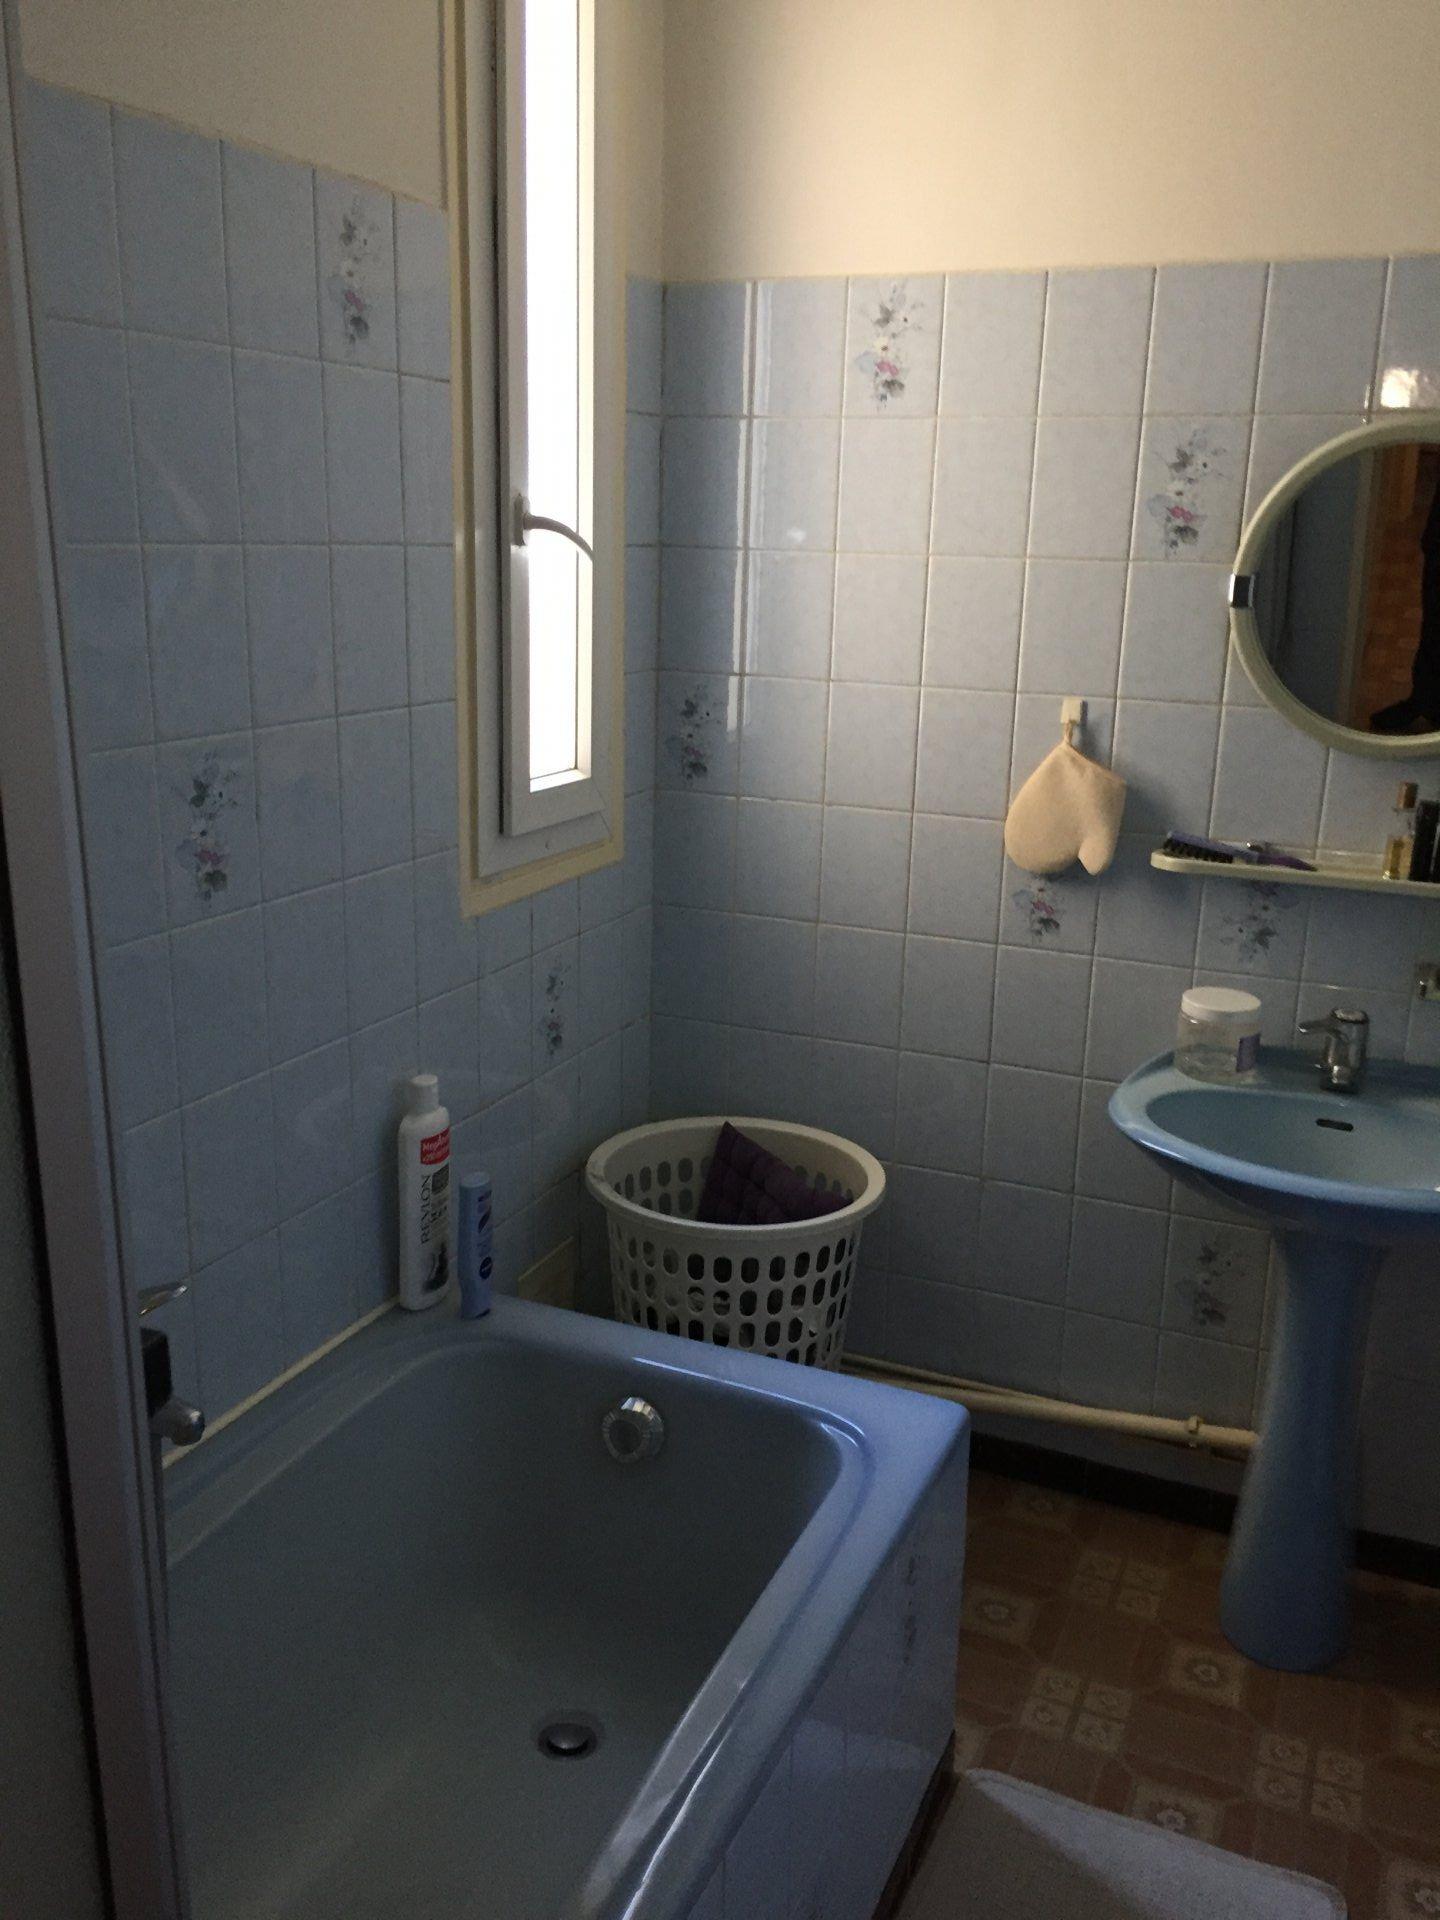 3P BAGNEUX, 54 m² proche ligne 4